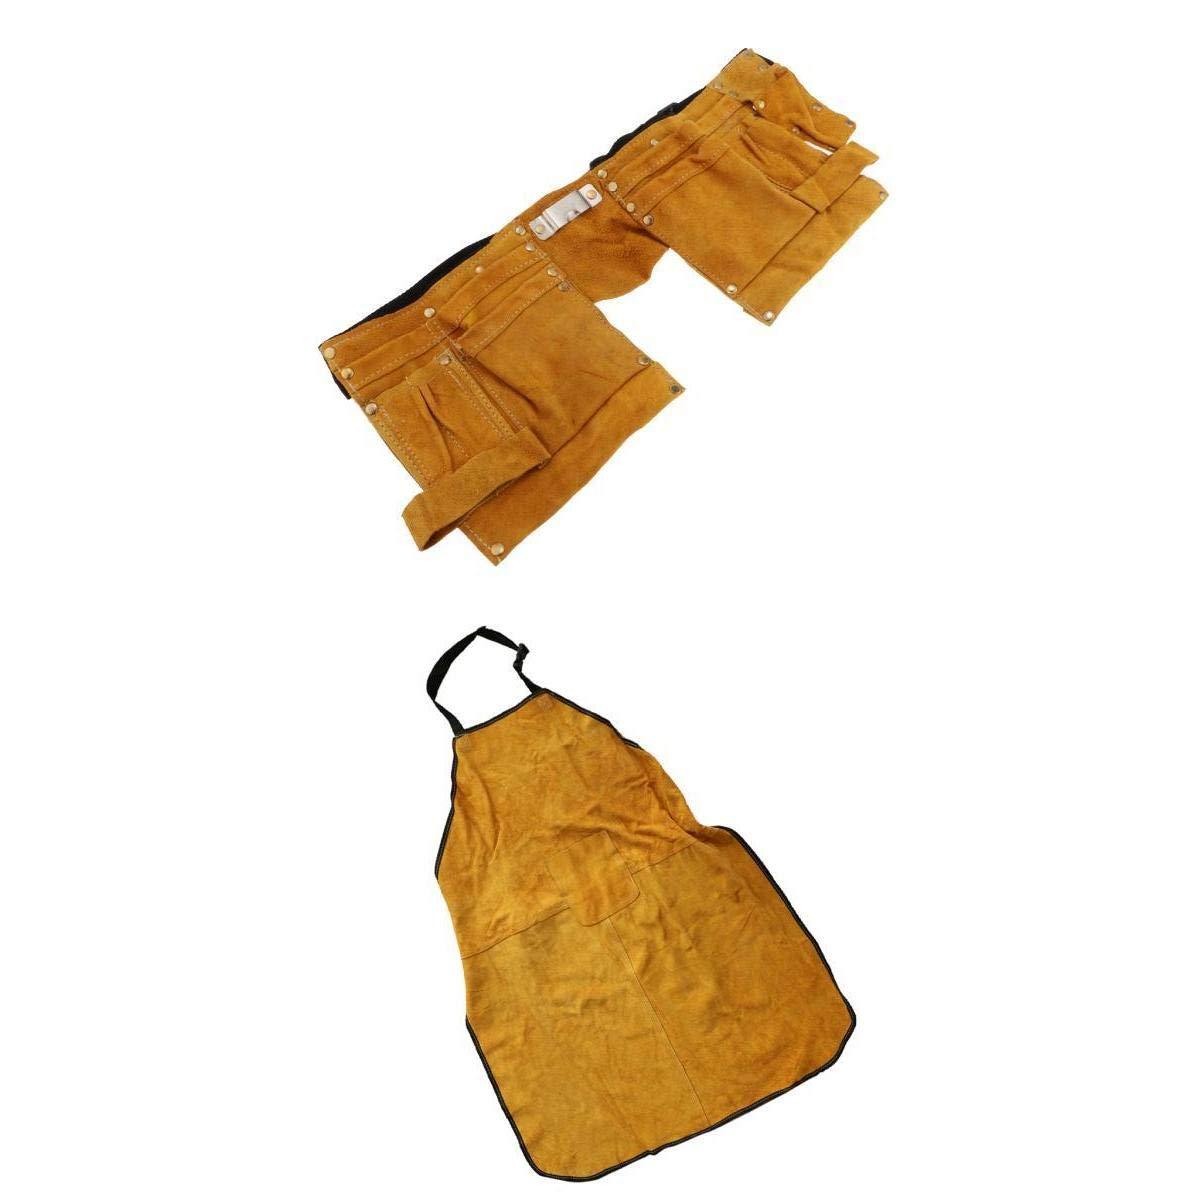 MagiDeal Fireproof Wear Resistant Insulation Electric Weld Apron + Weld Kit Waist Bag